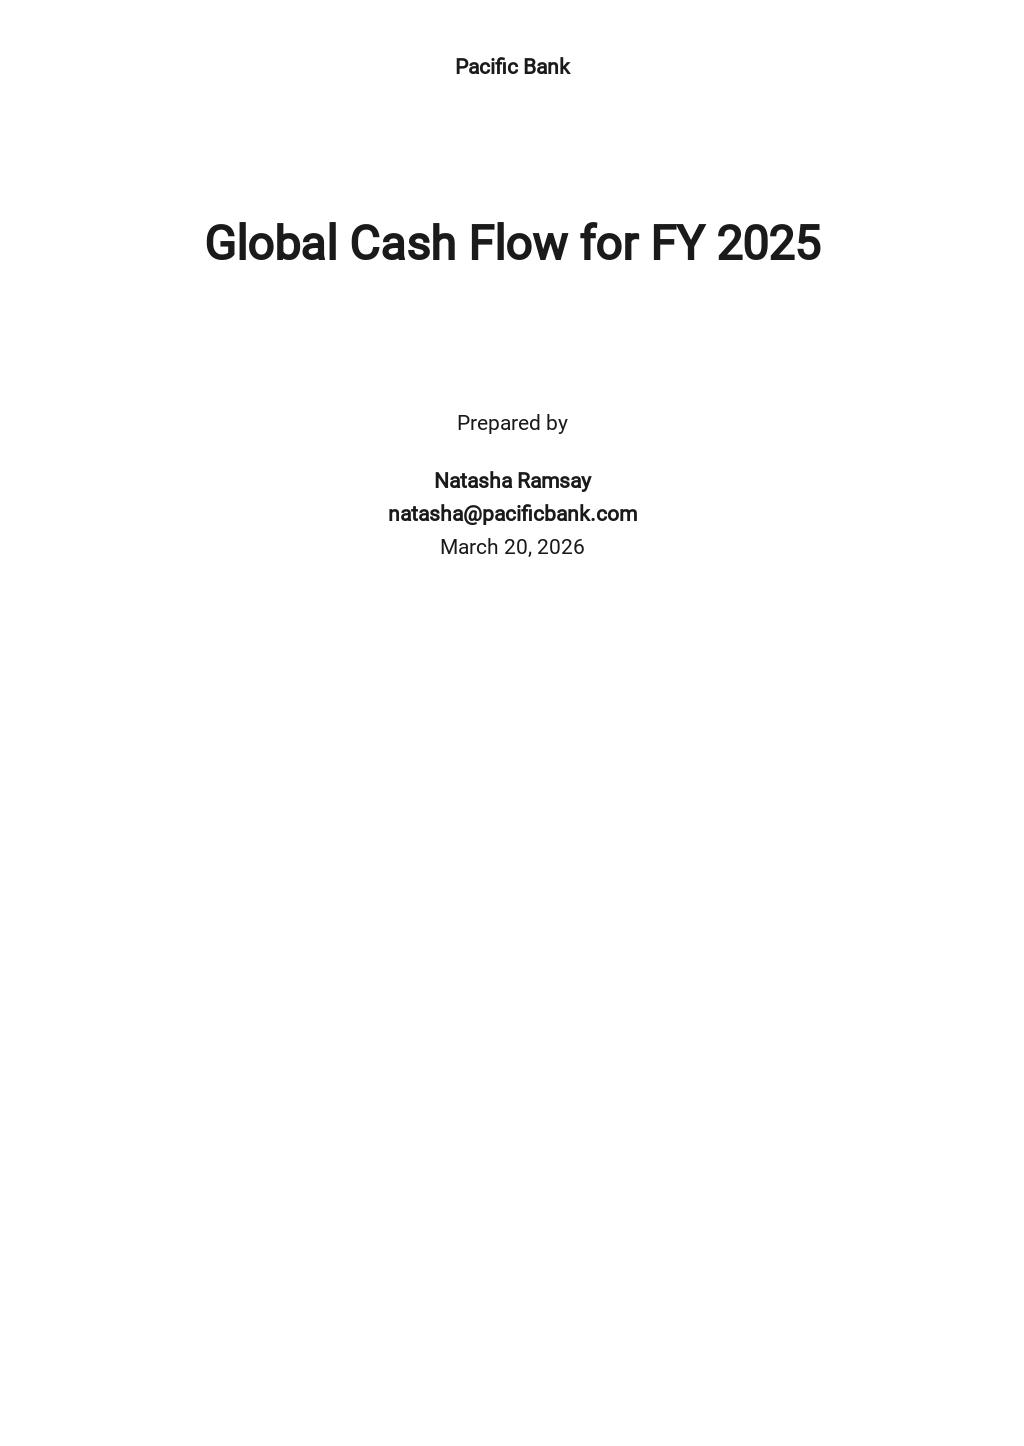 Global Cash Flow Analysis Template